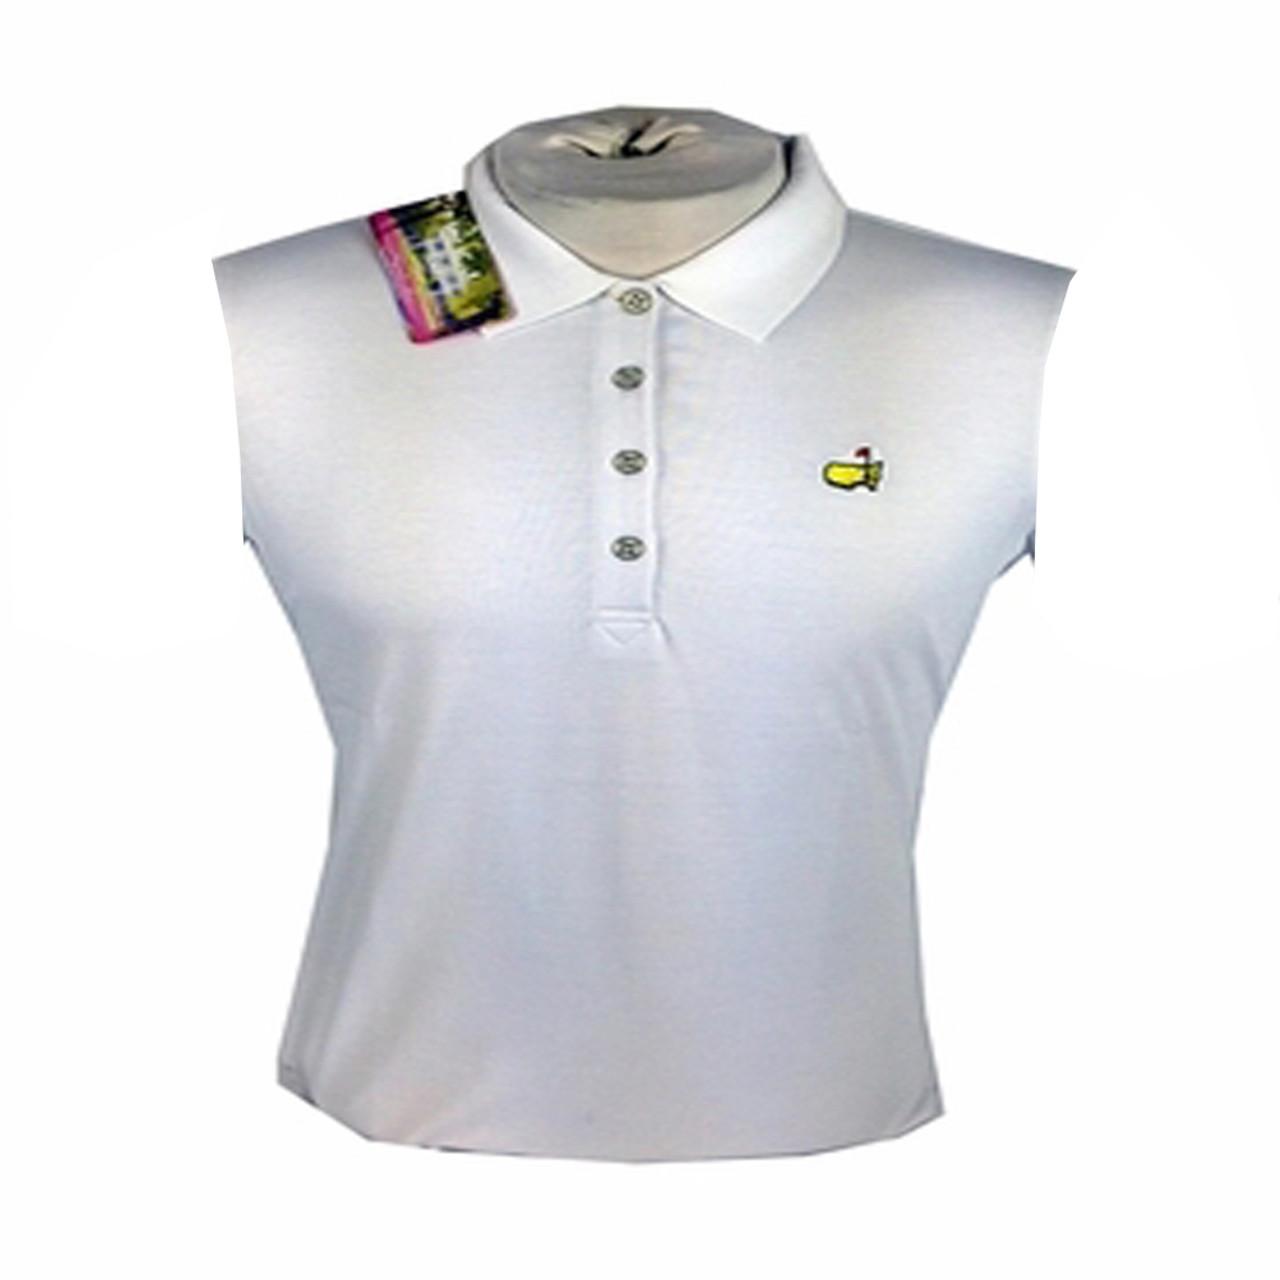 54f611819 Masters Ladies Golf Shirt - White - Masters Ladies & Children